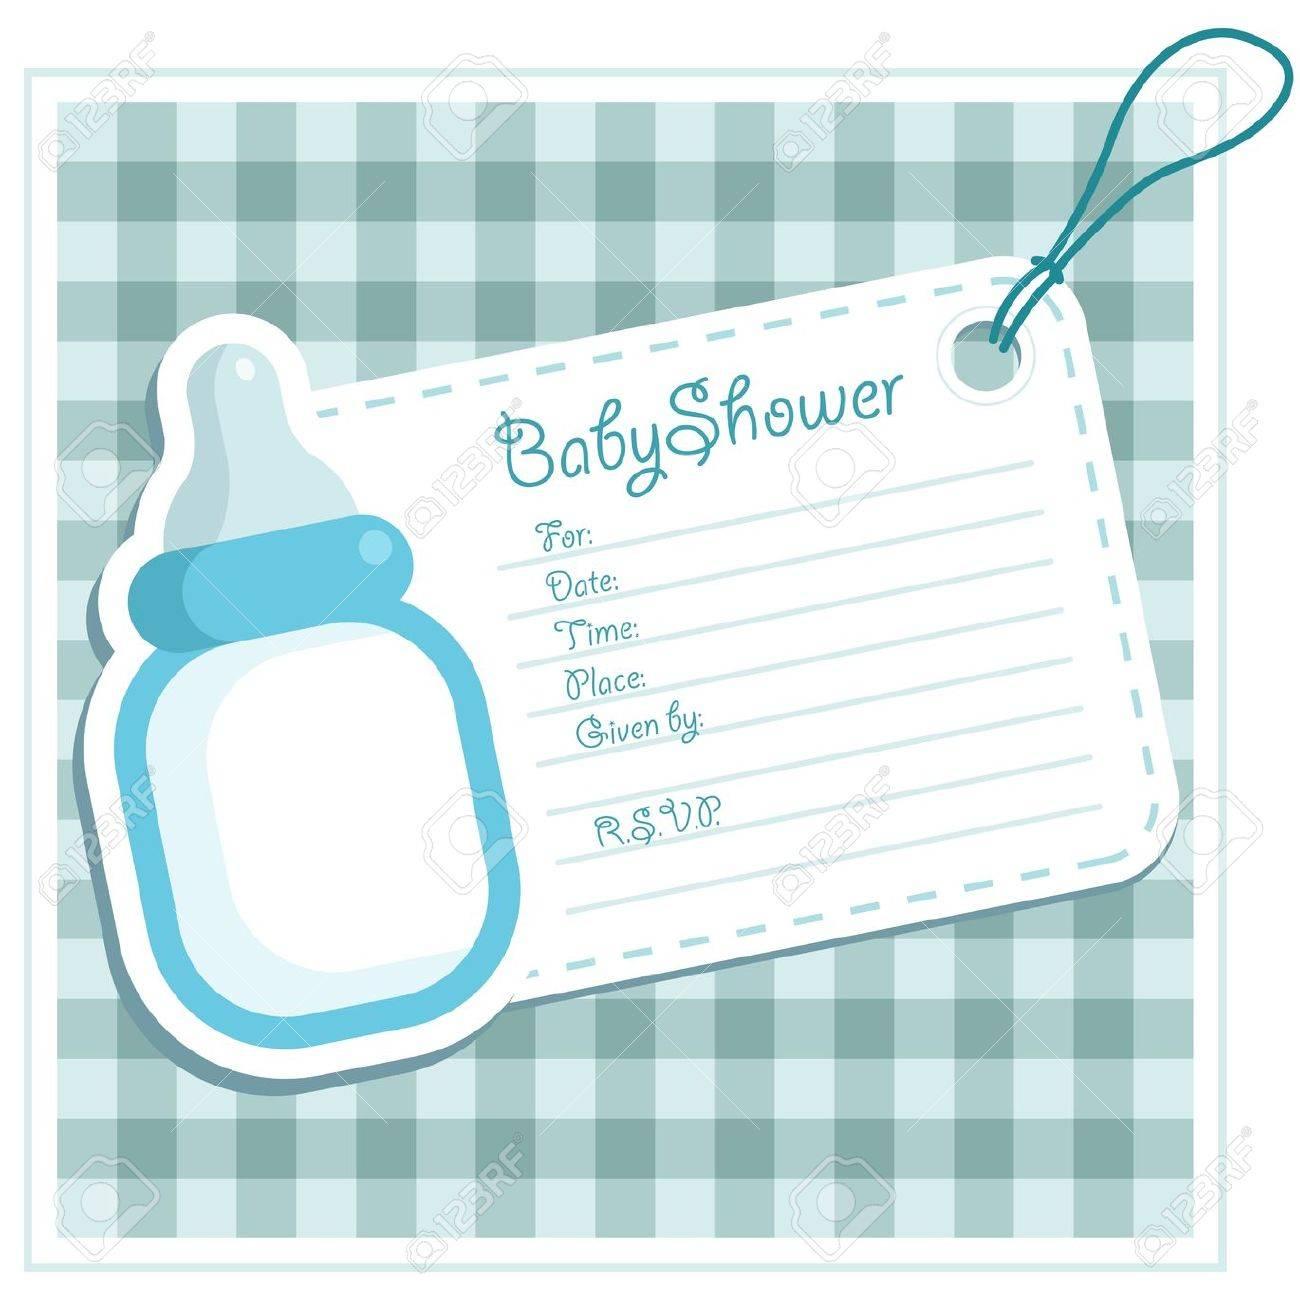 Baby Boy Shower Bottle Invitation Card Stock Vector - 11273358